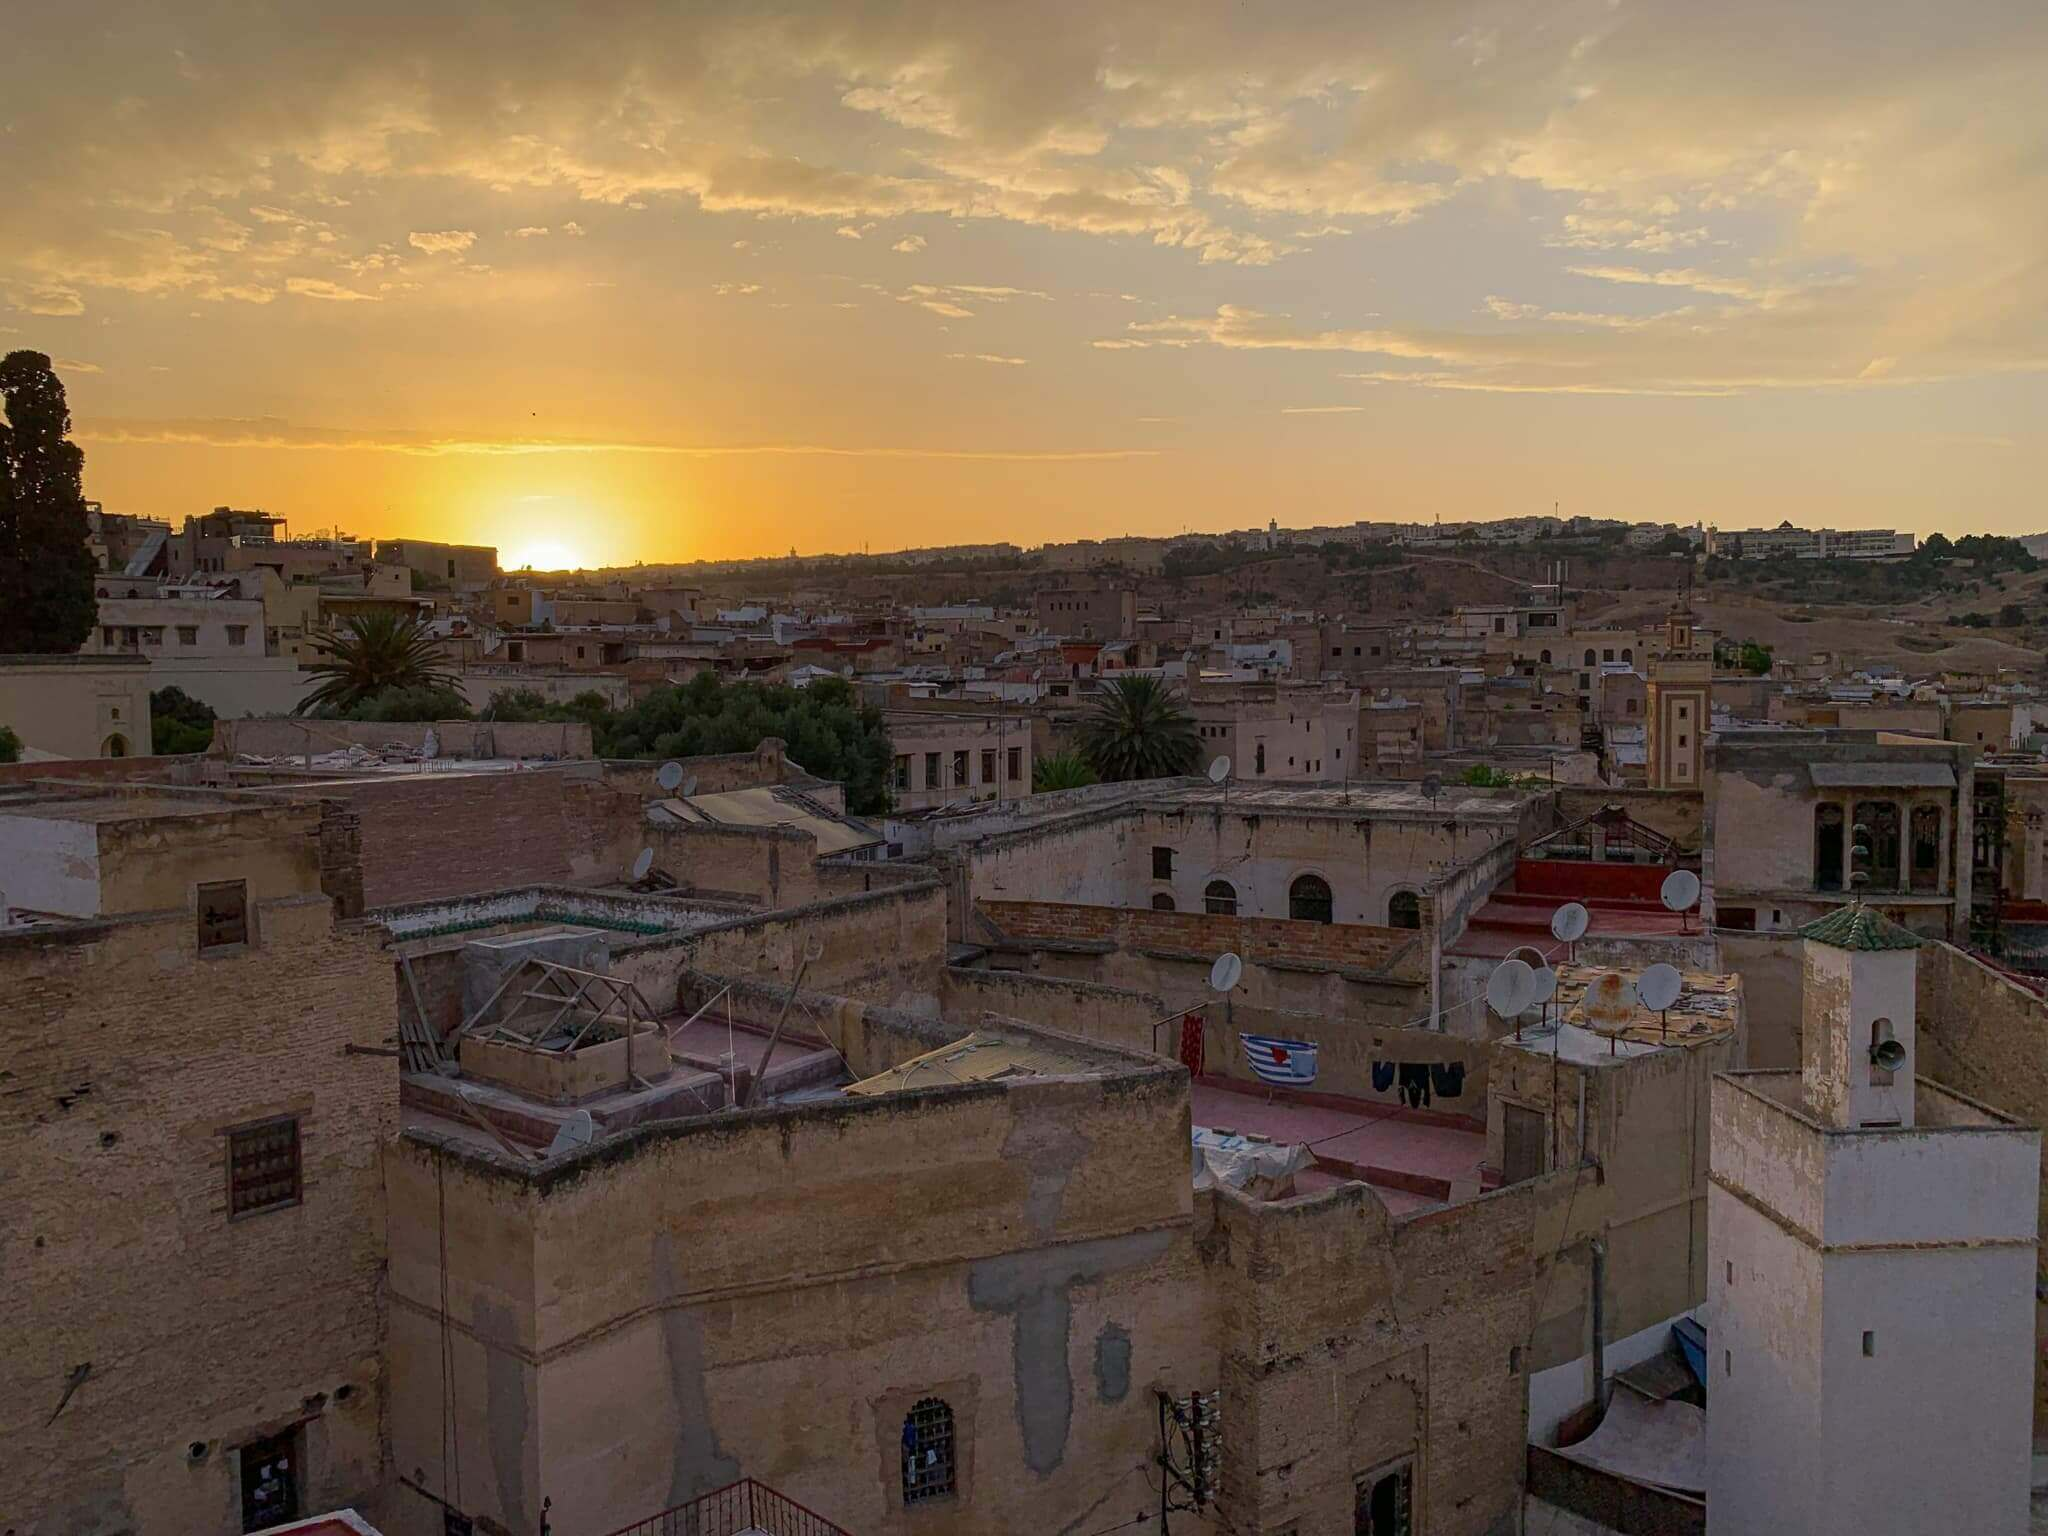 Fez Medina Sunset